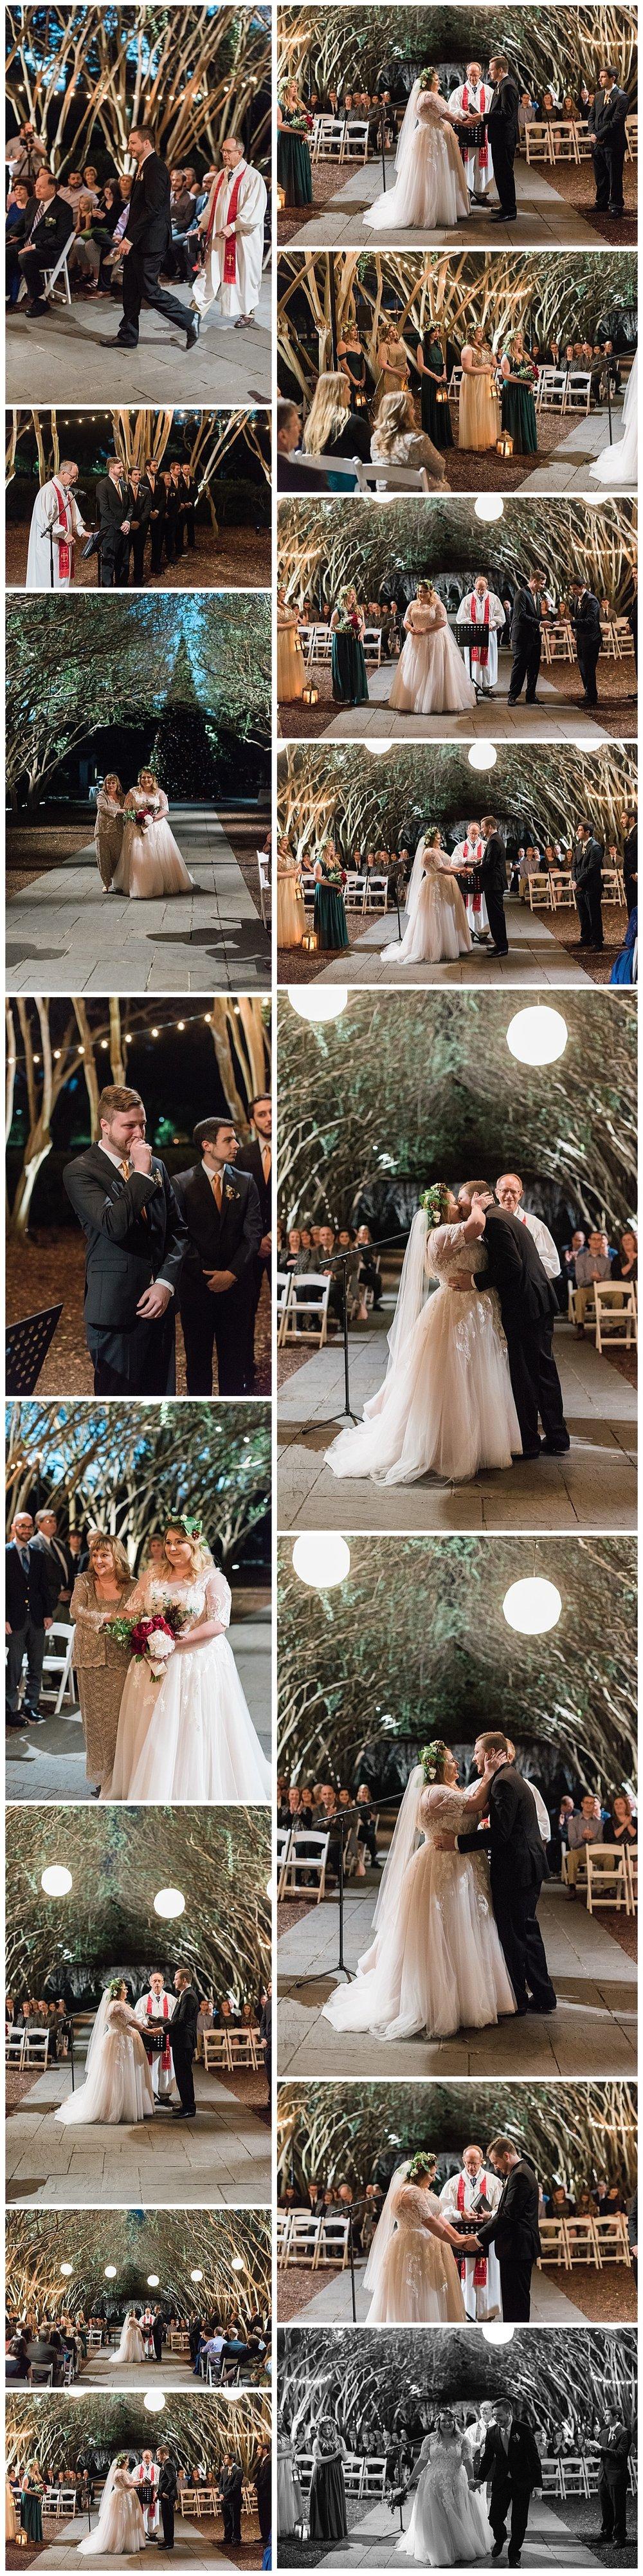 dallas-arboretum-and-botanical-garden-wedding-ar-photography-6.jpg